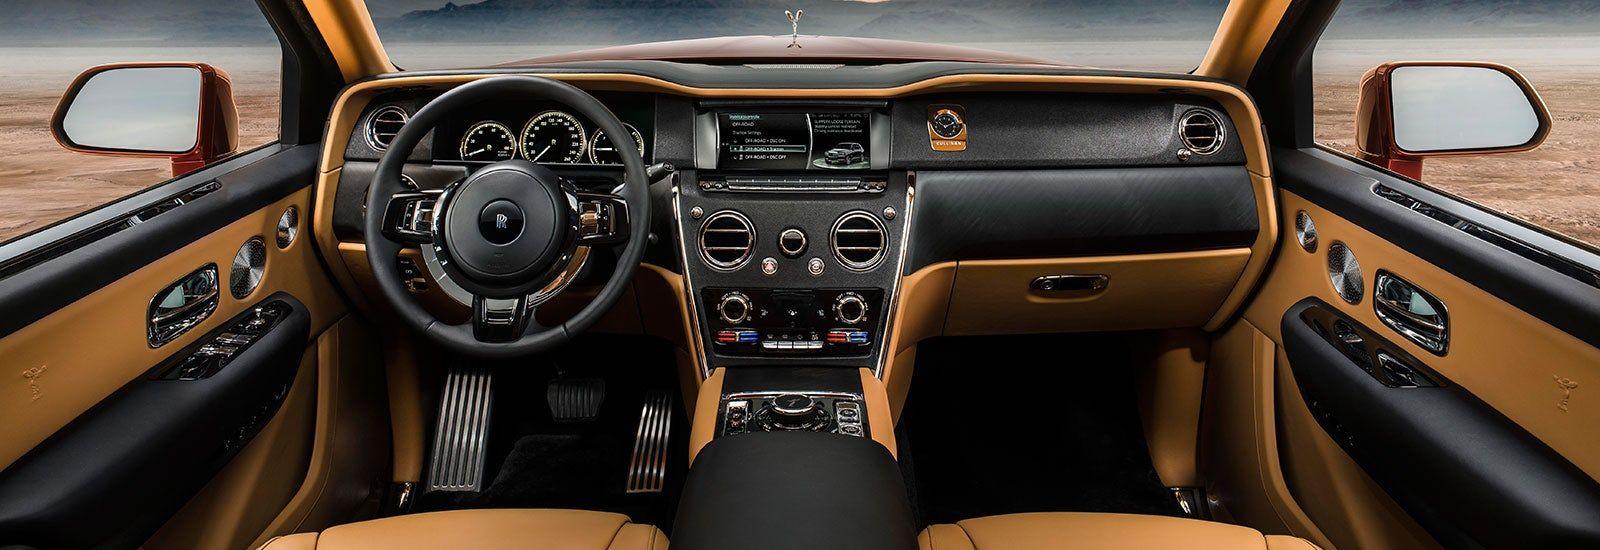 Rolls Royce Cullinan Suv Price Specs Cars Rolls Royce